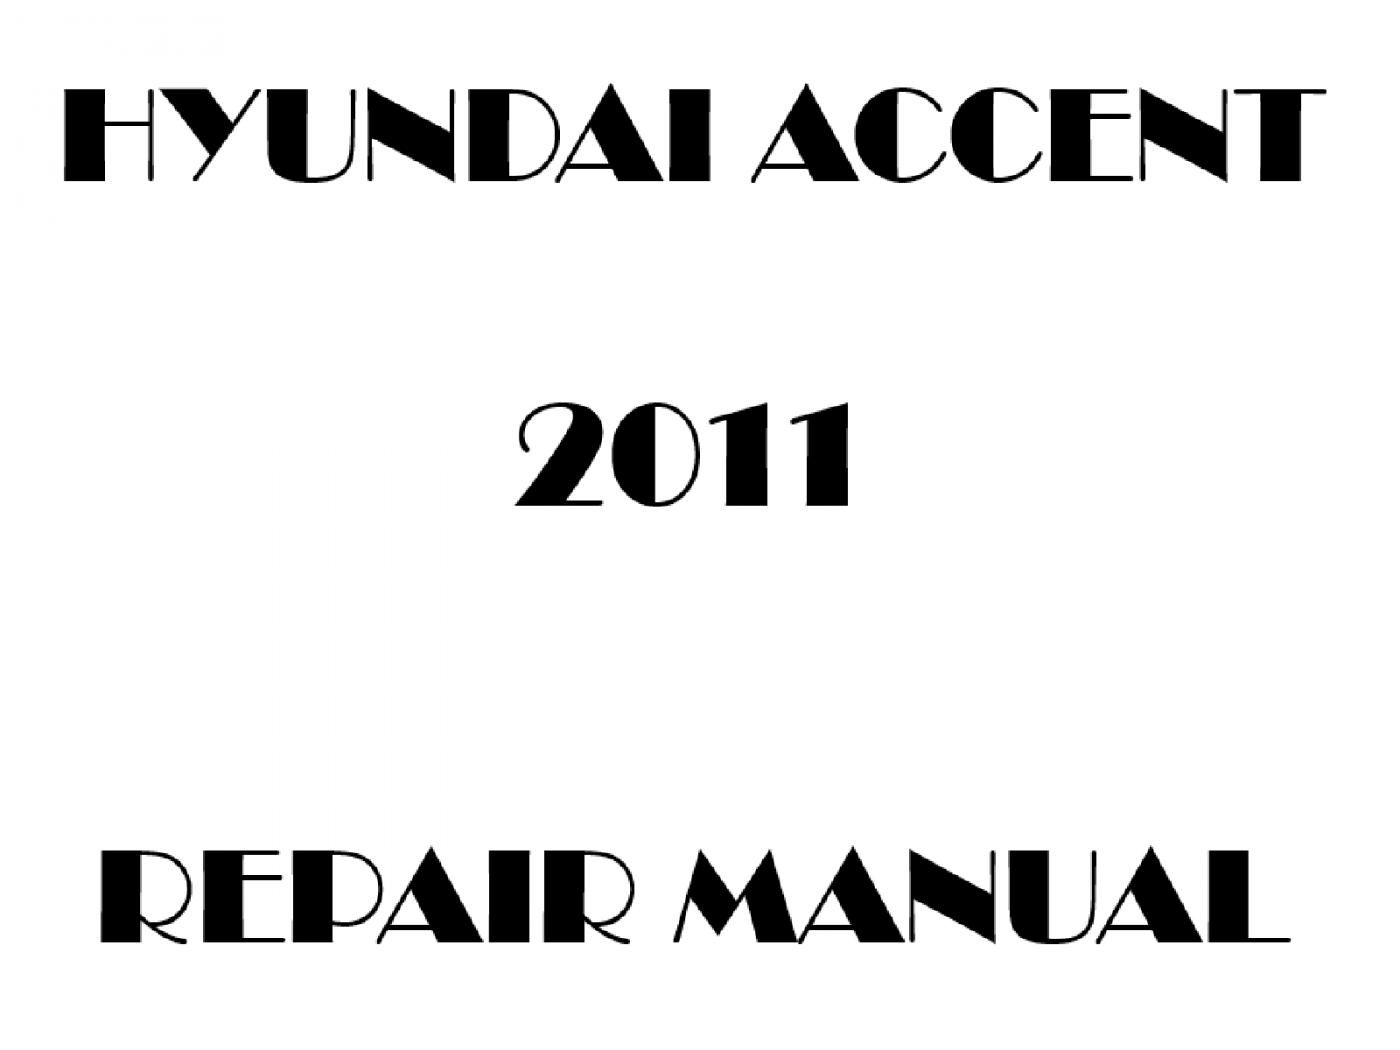 2011 Hyundai Accent repair manual